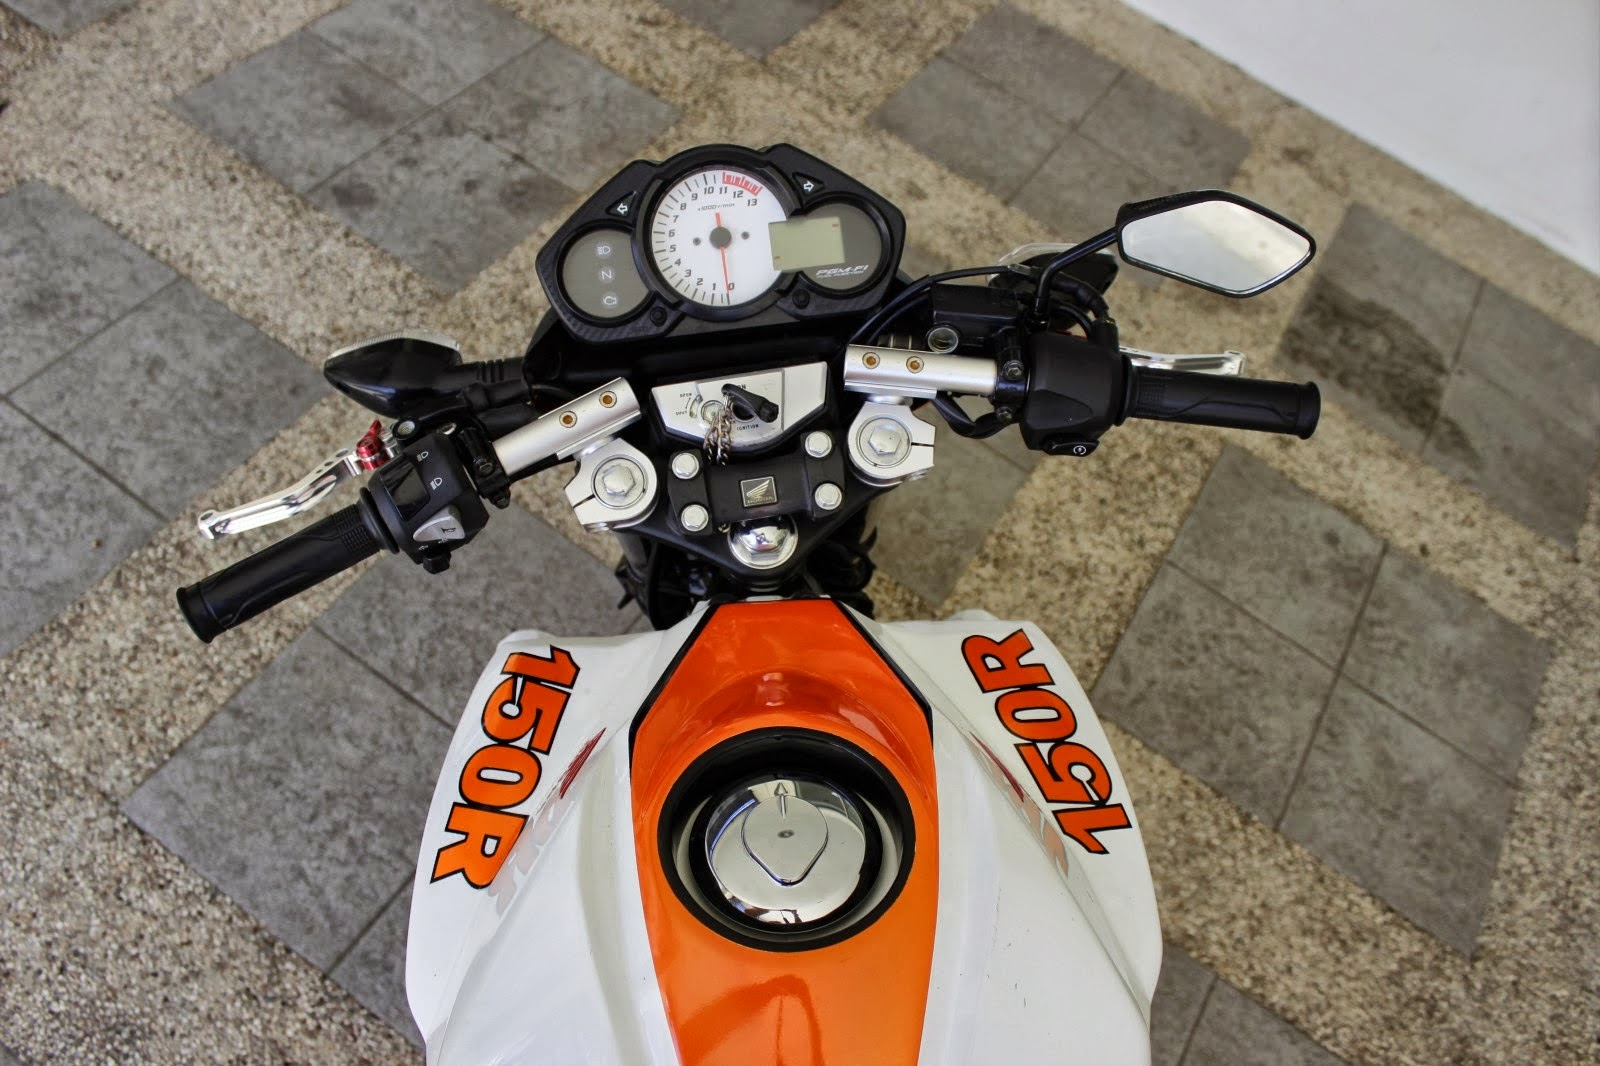 100 Modifikasi Motor Cbr 150 Velg 17 Modifikasi Motor Honda CB Terbaru